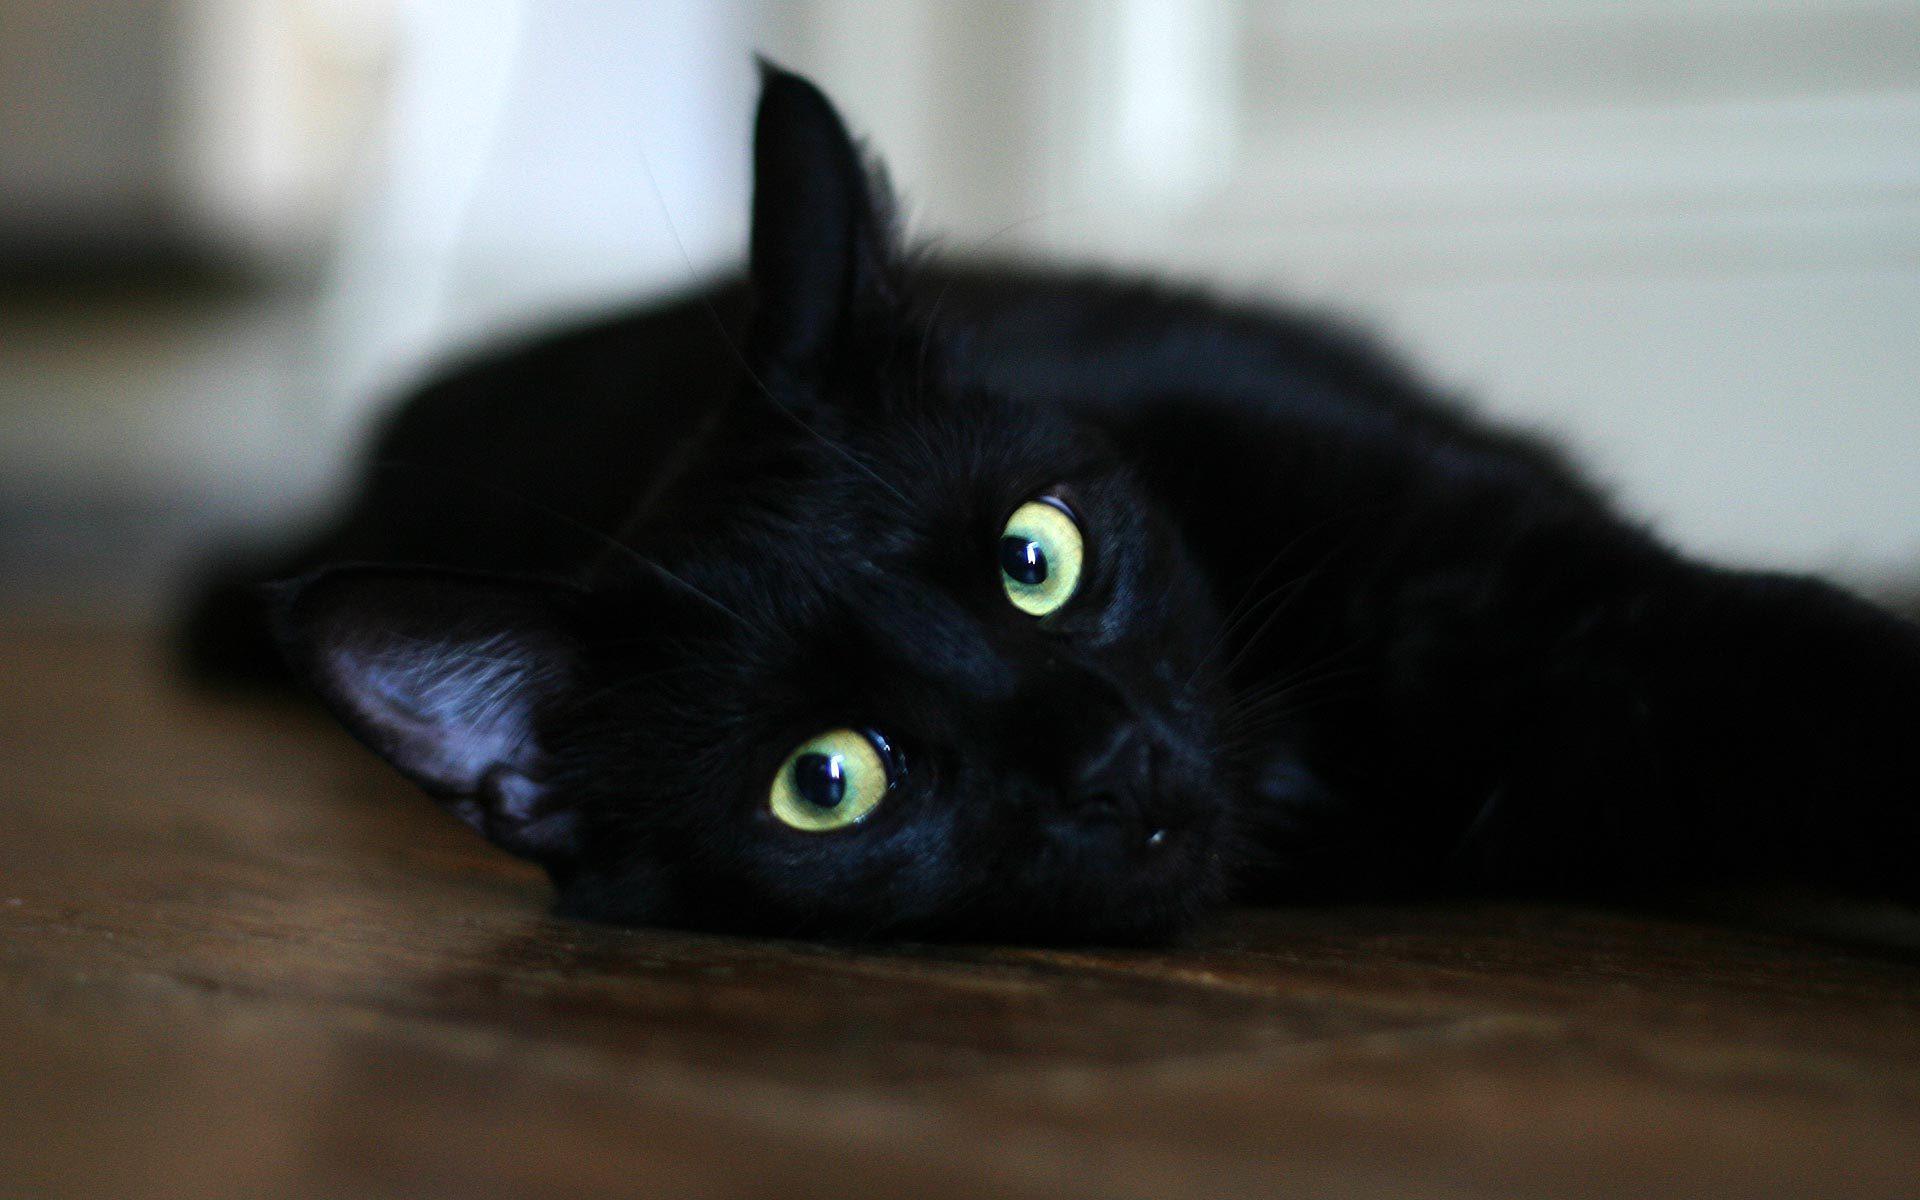 http://www.zastavki.com/pictures/originals/2013/Animals___Cats__Black_cat_resting_on_the_floor_044880_.jpg